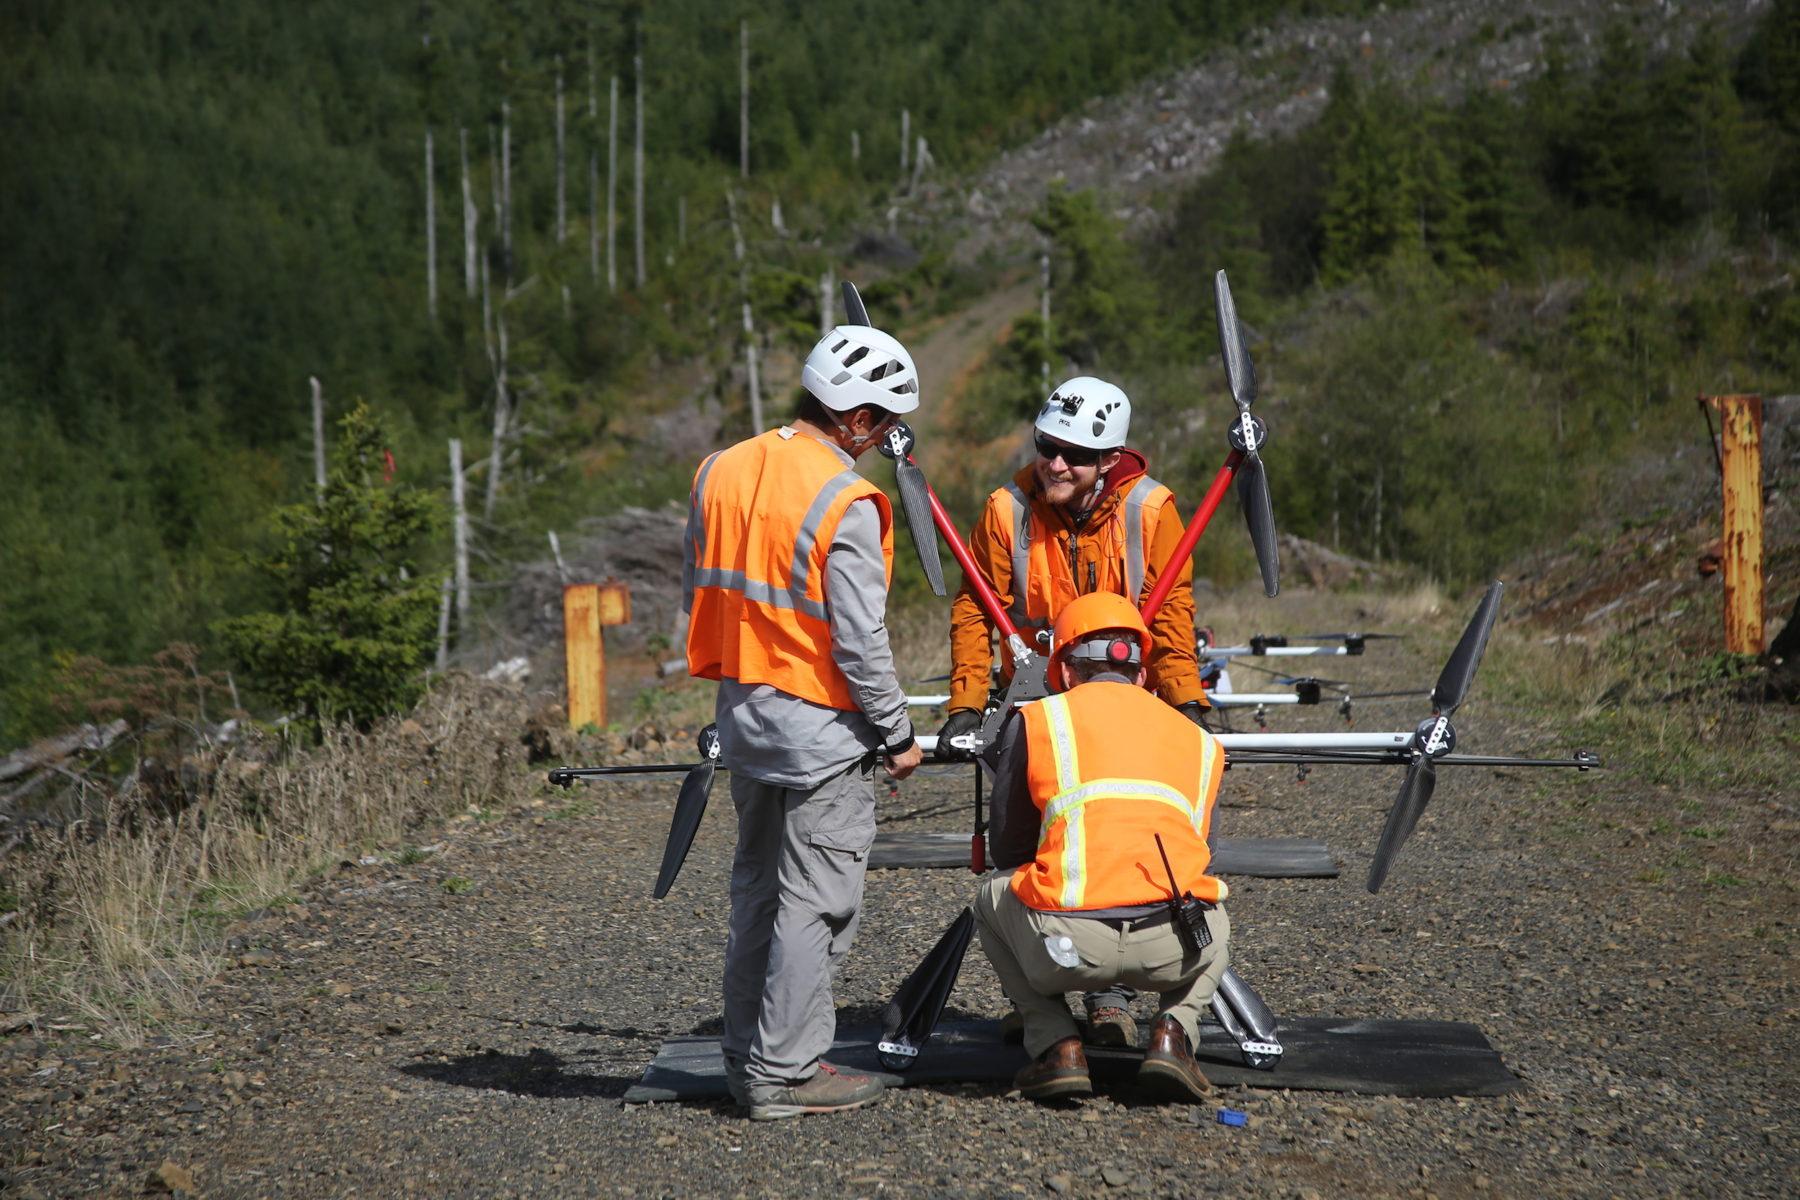 dronele pot rezolva problema defirserilor